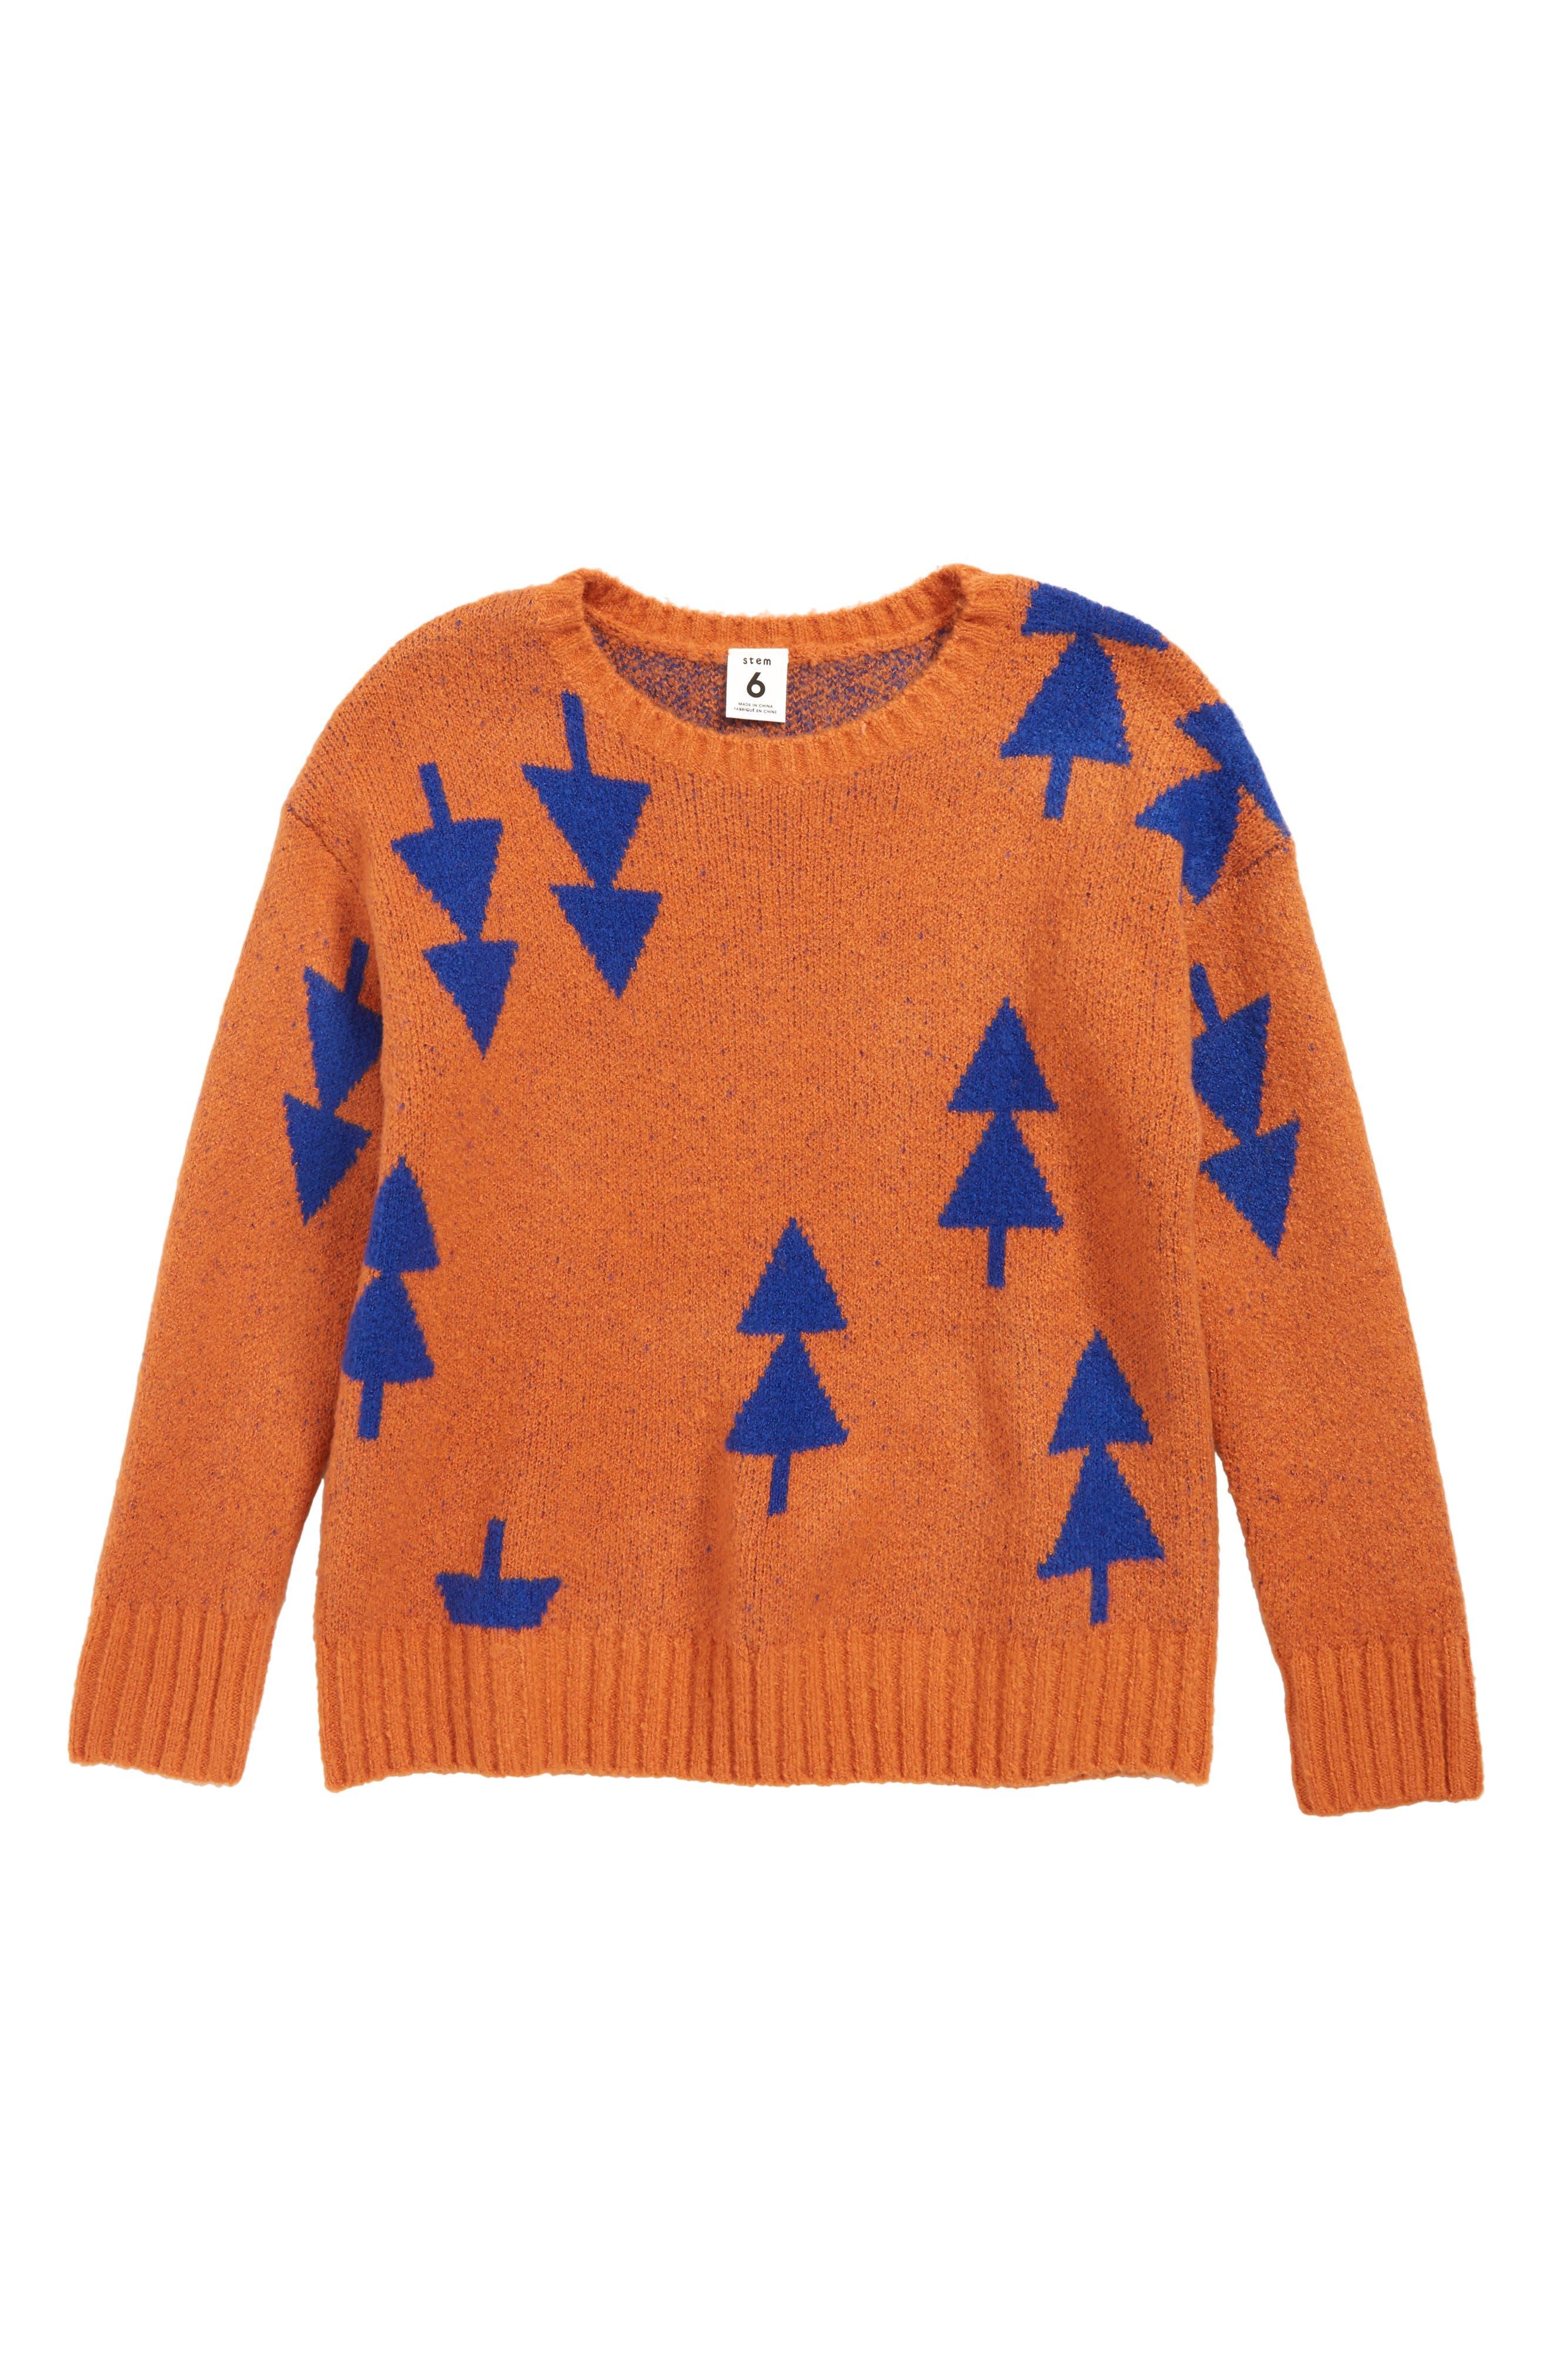 Intarsia Sweater,                         Main,                         color, RUST LEAF- BLUE GEO TREES